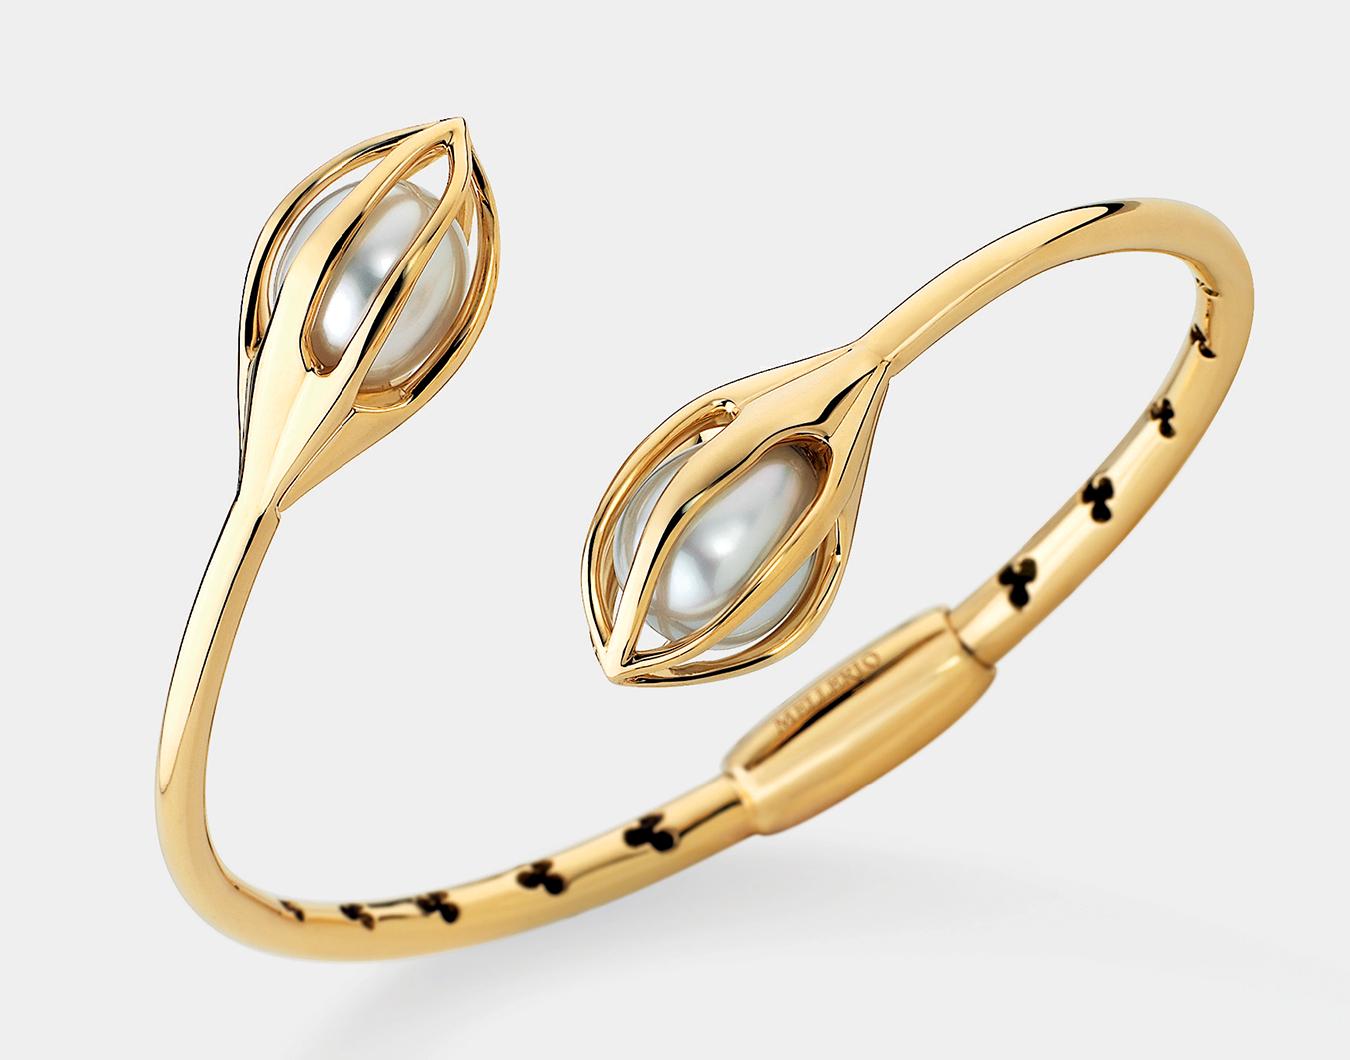 NUVO Magazine: Mellerio dits Meller Jewellery